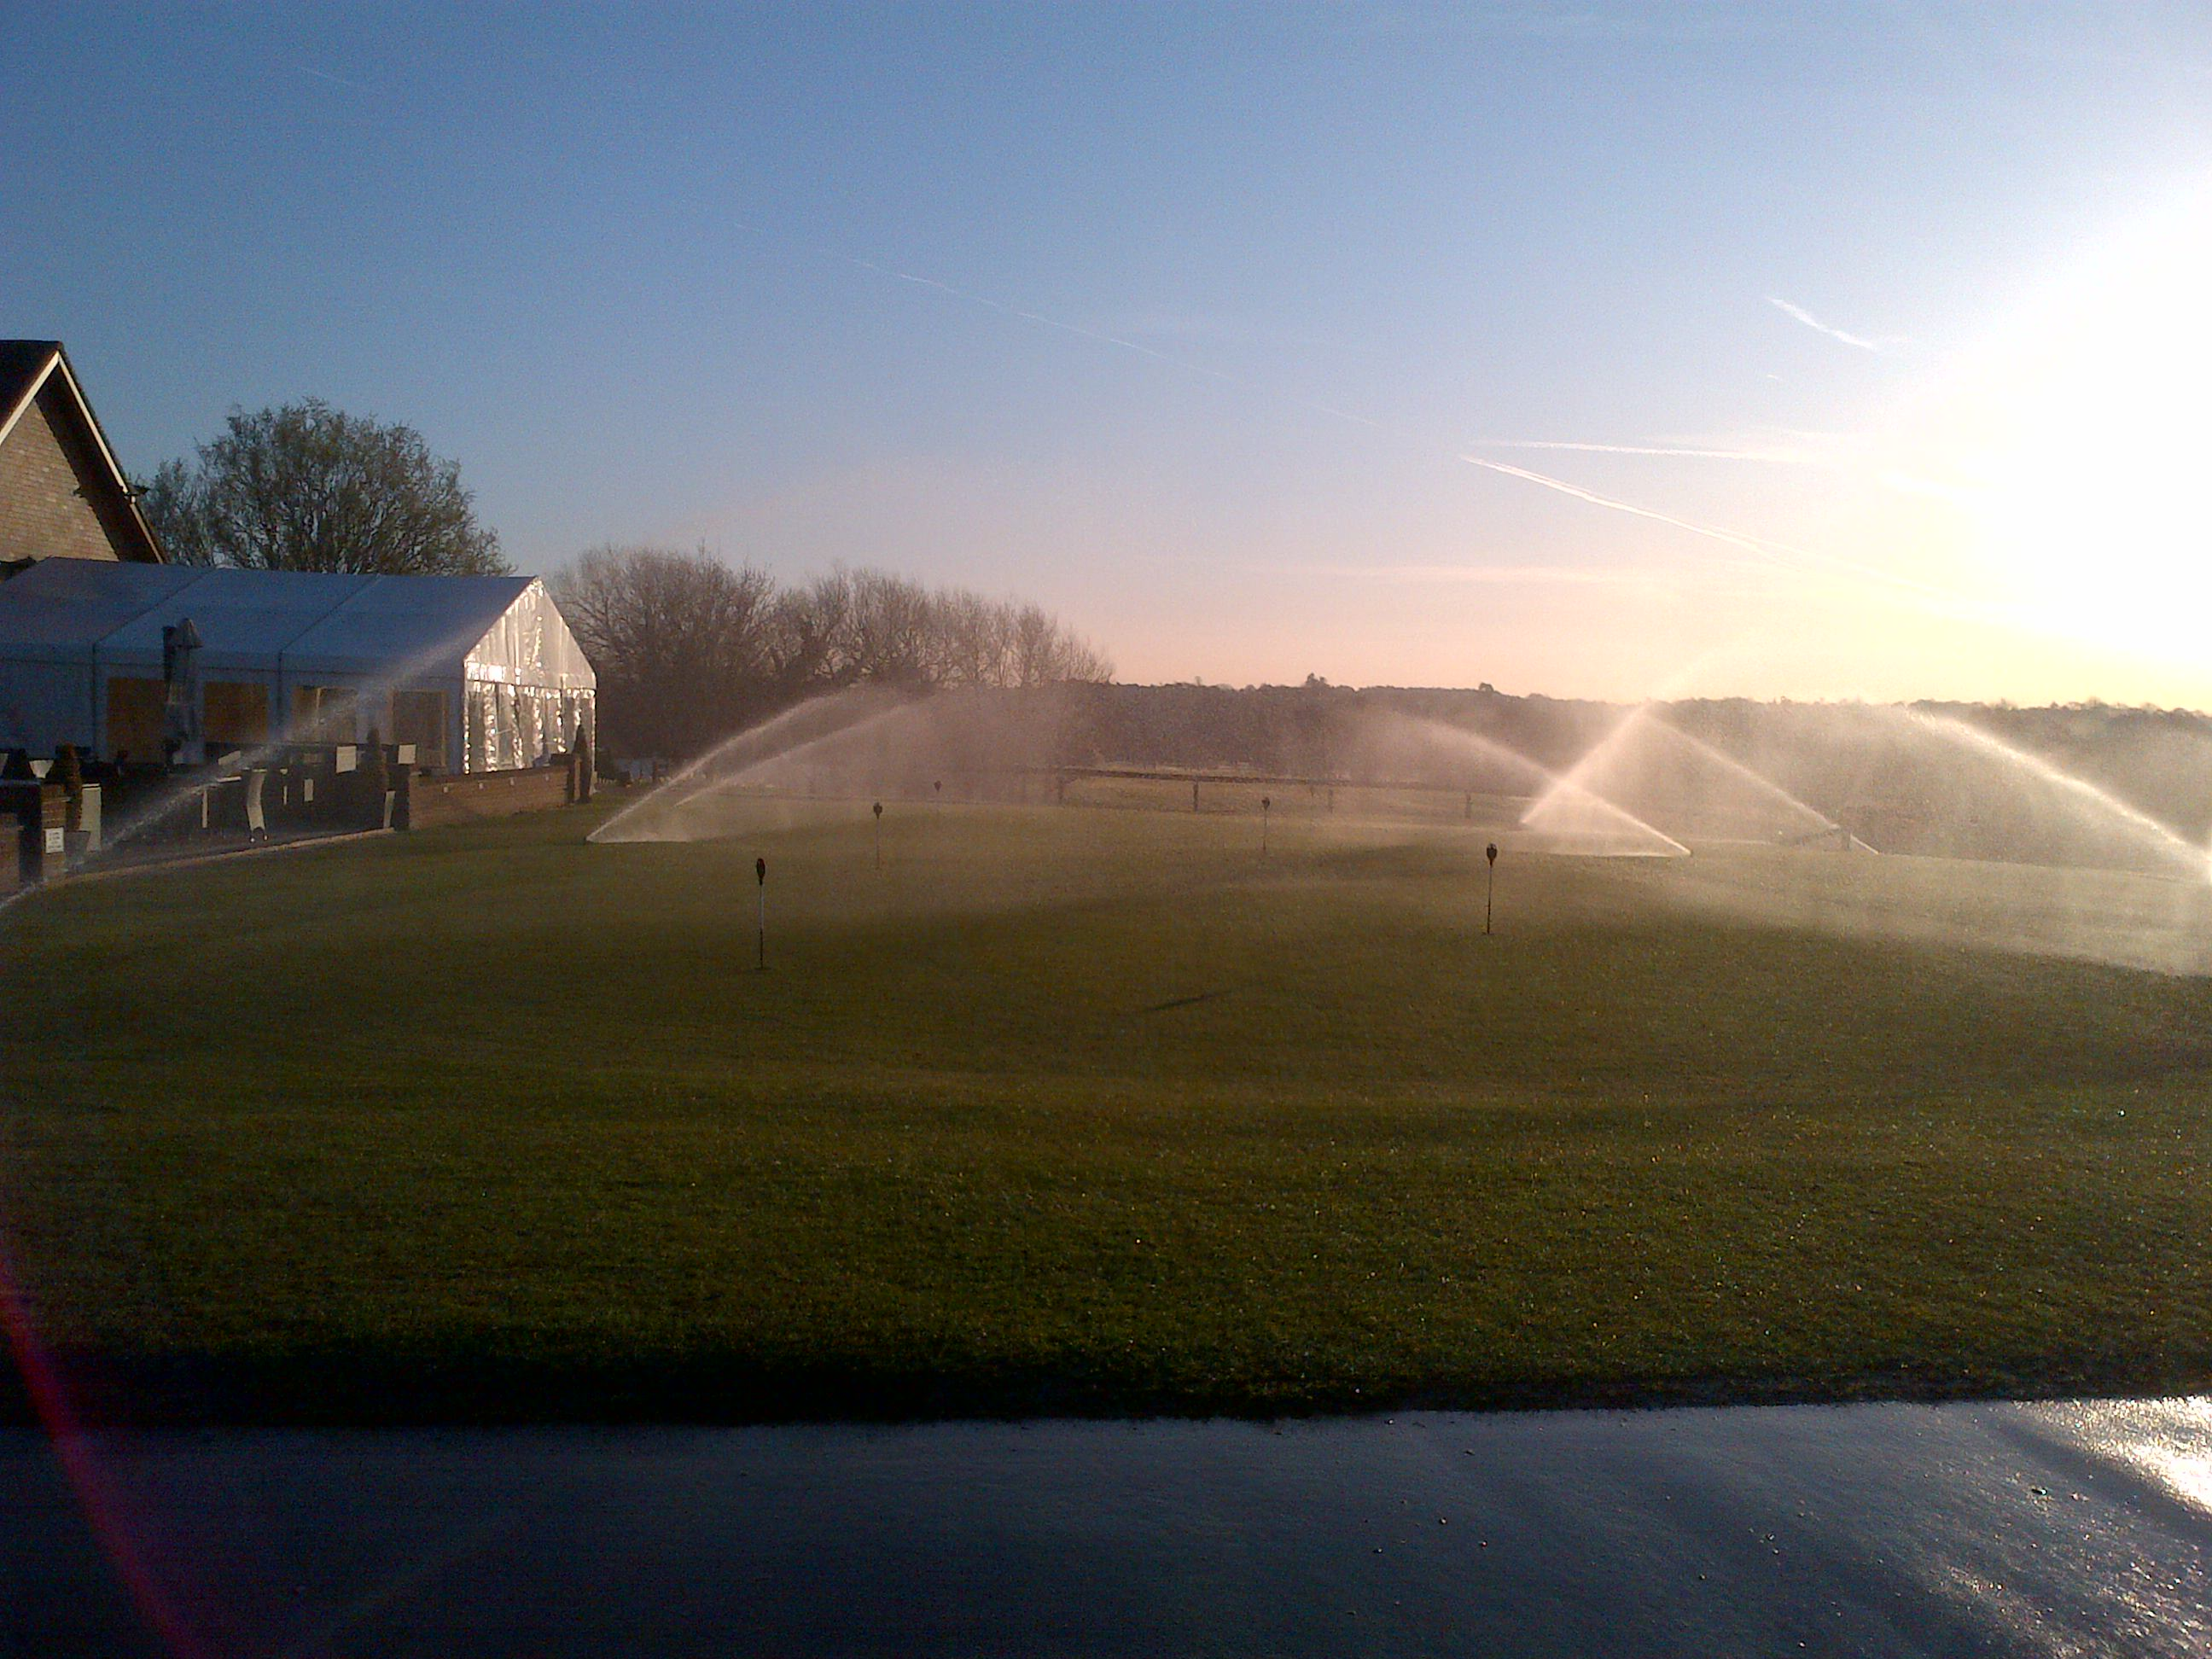 Course works Wk Beginning Monday th March Windlesham Golf